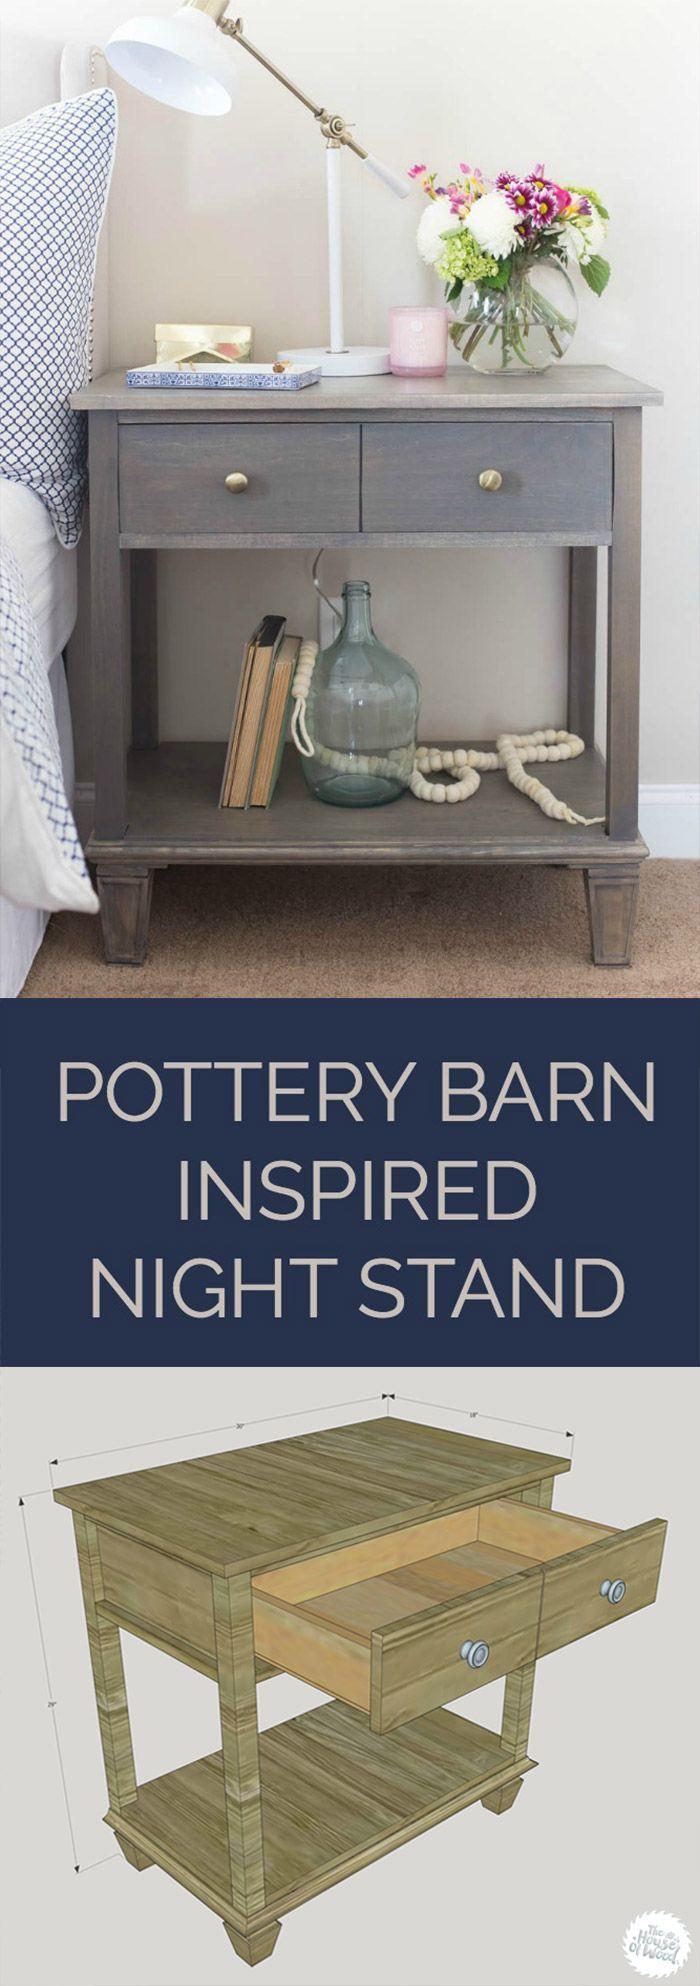 DIY Pottery BarnInspired Sausalito Bedside Table